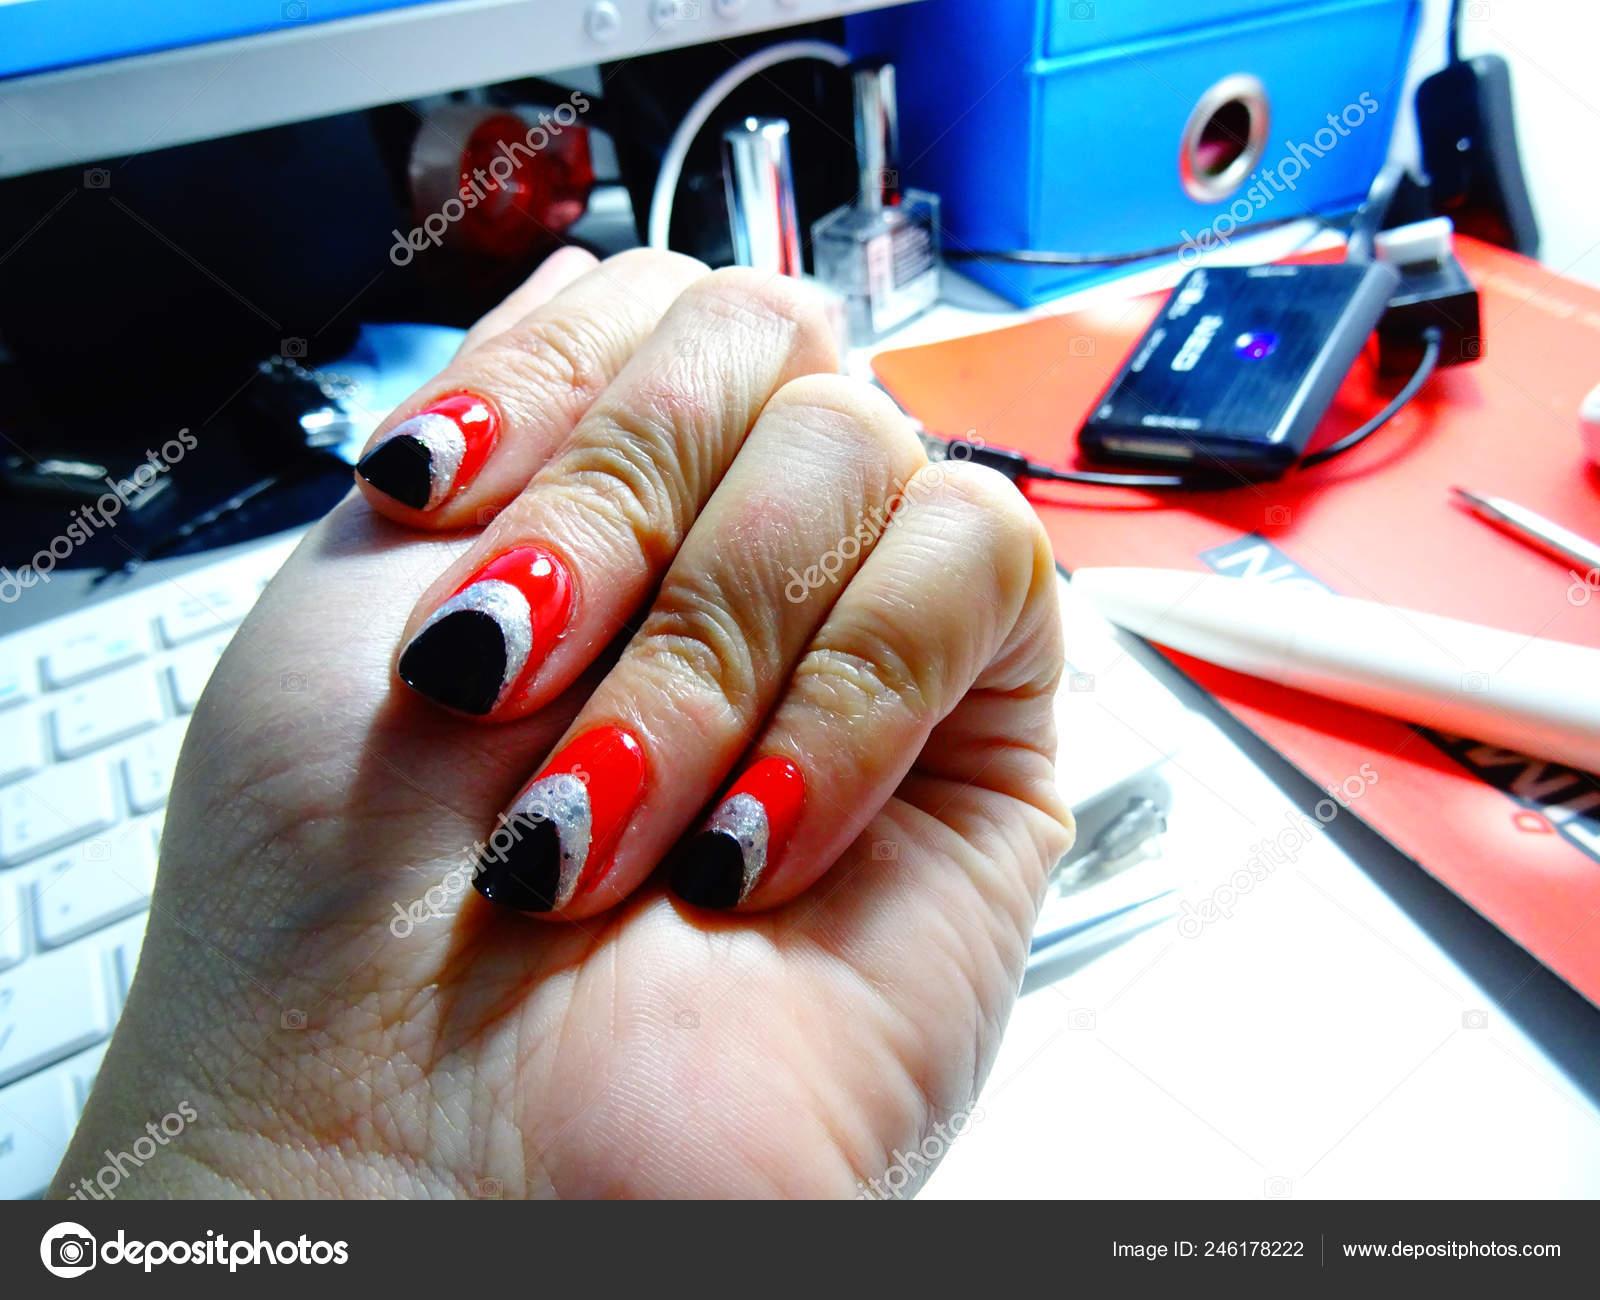 Rojo Negro Esmalte Uñas Arte Fotos De Stock Imagesto